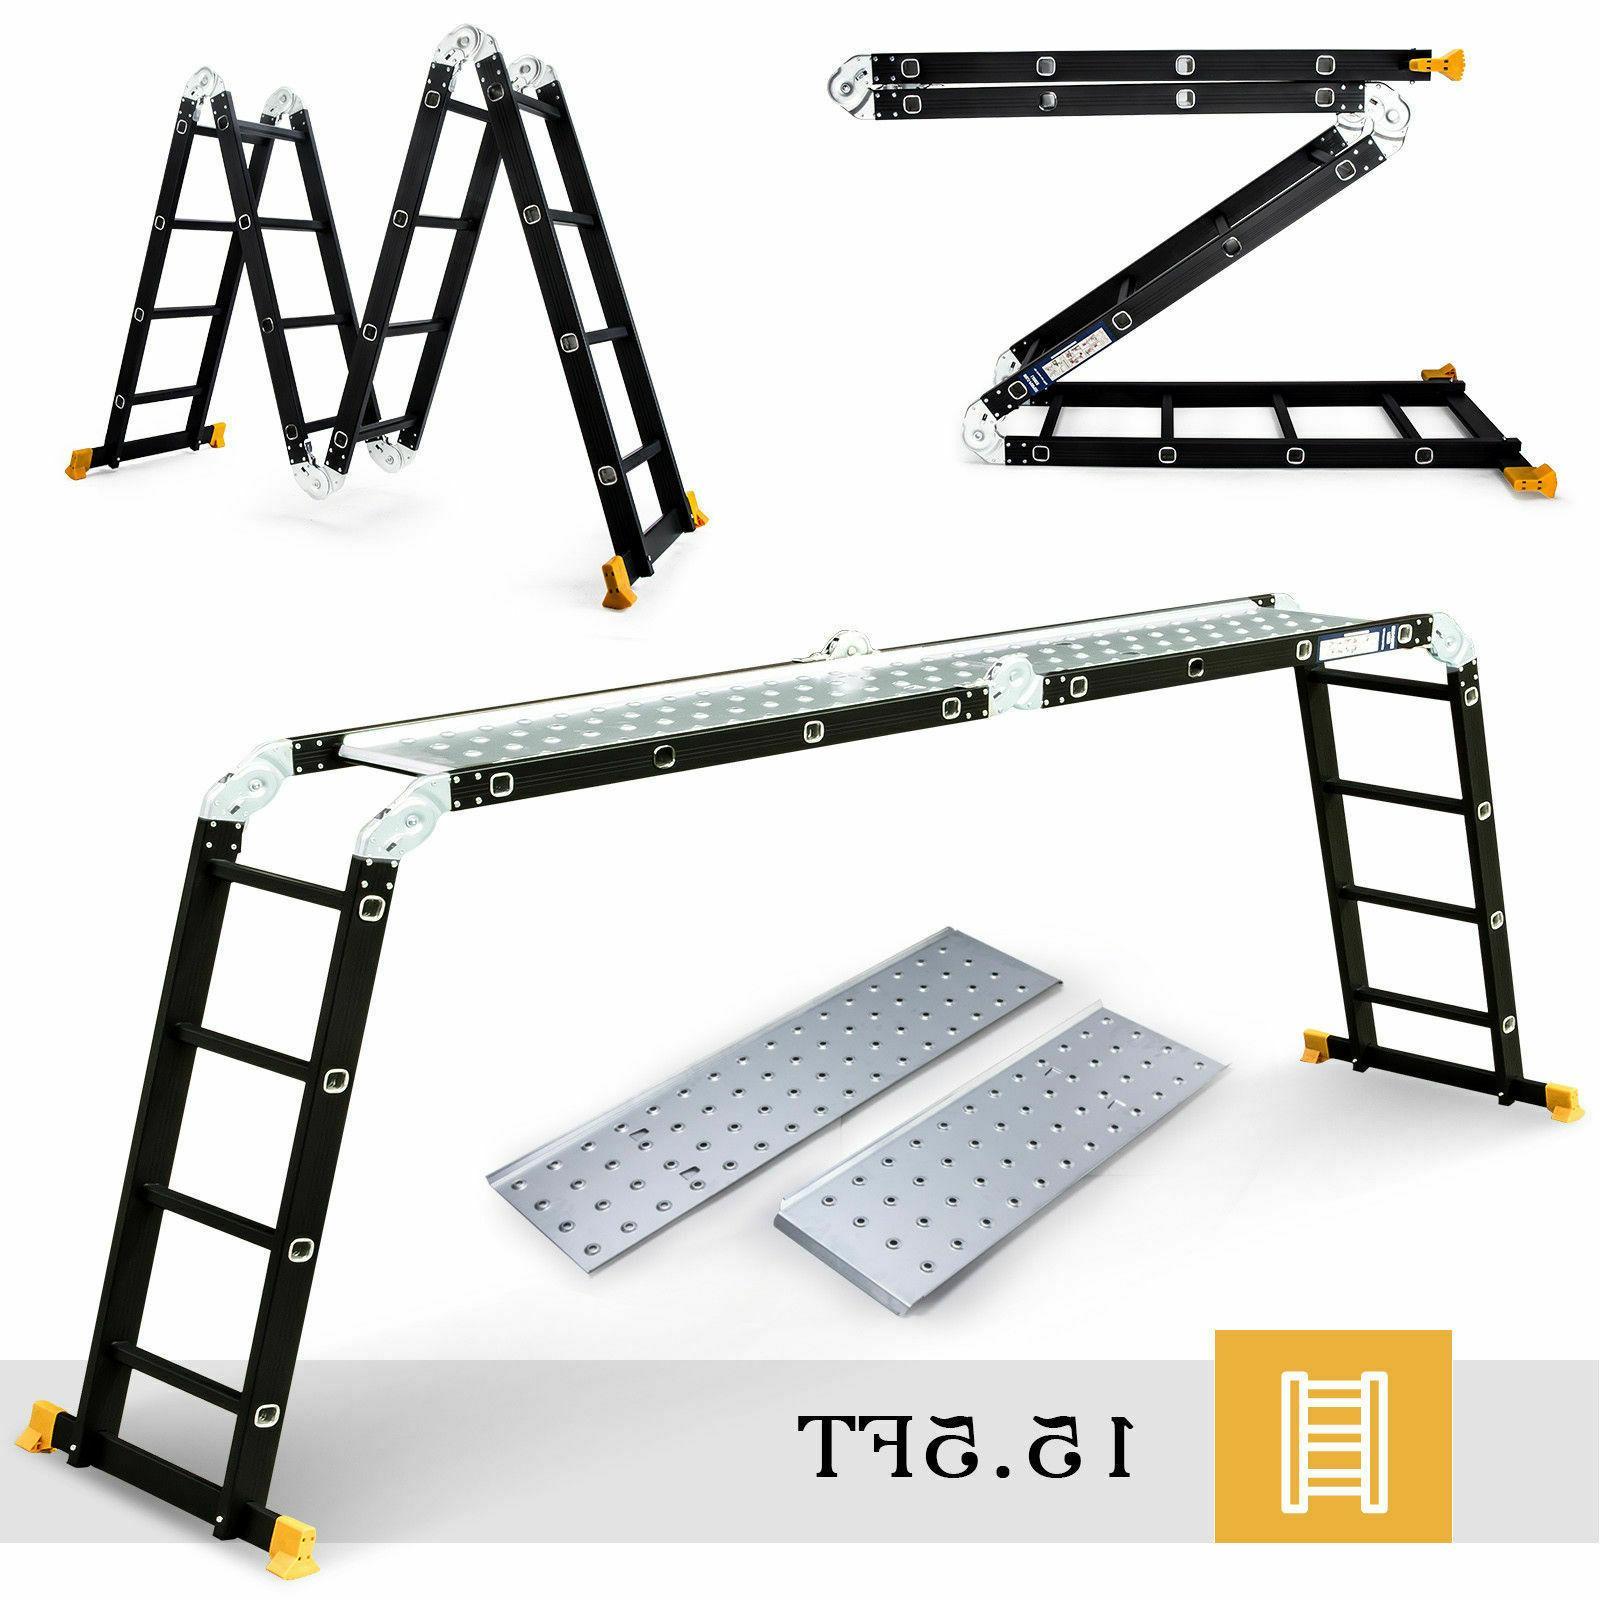 New Ladder Multi-Purpose Aluminium Heavy Duty